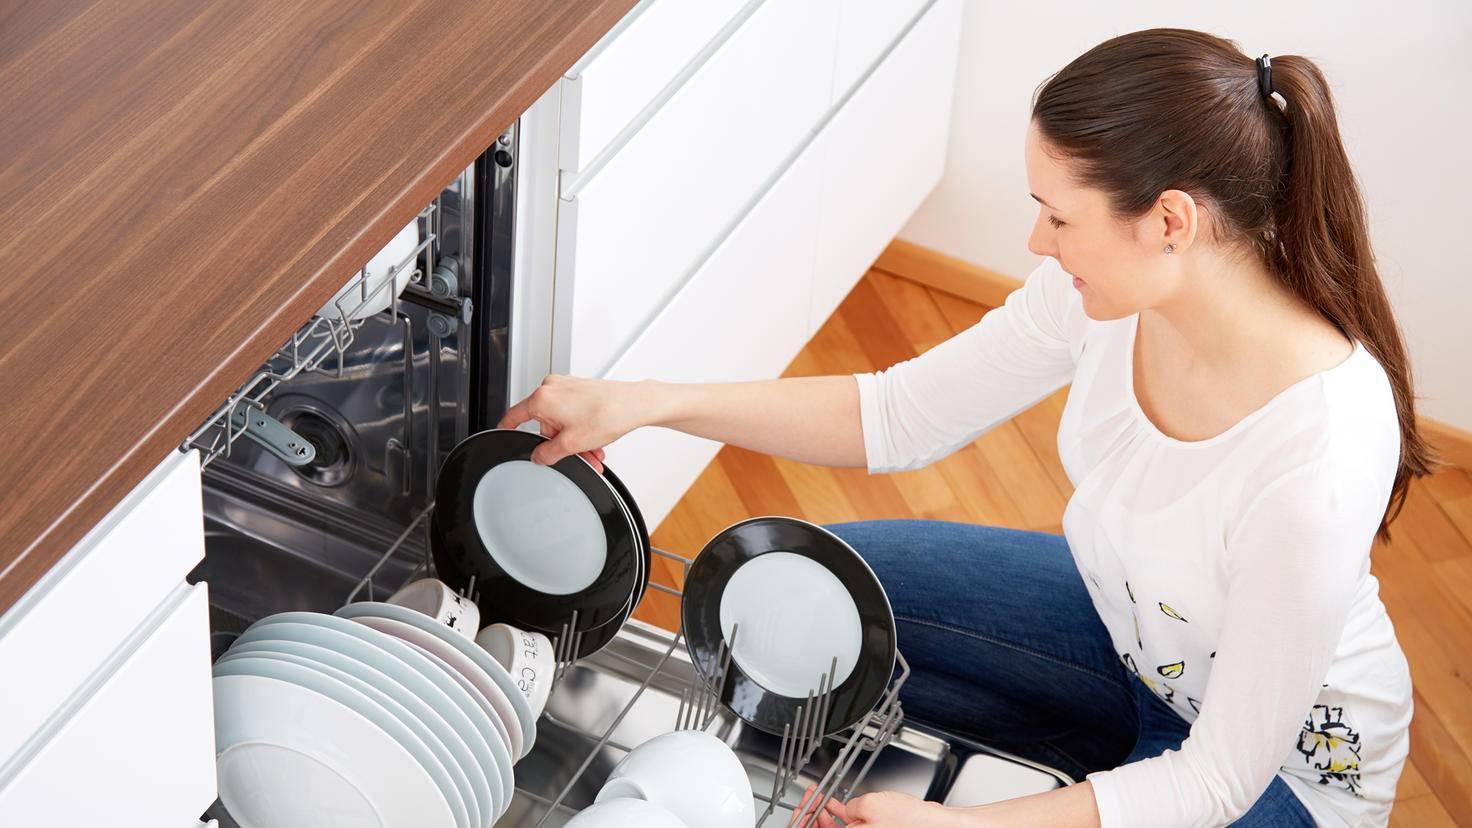 kitchen dishwasher woman